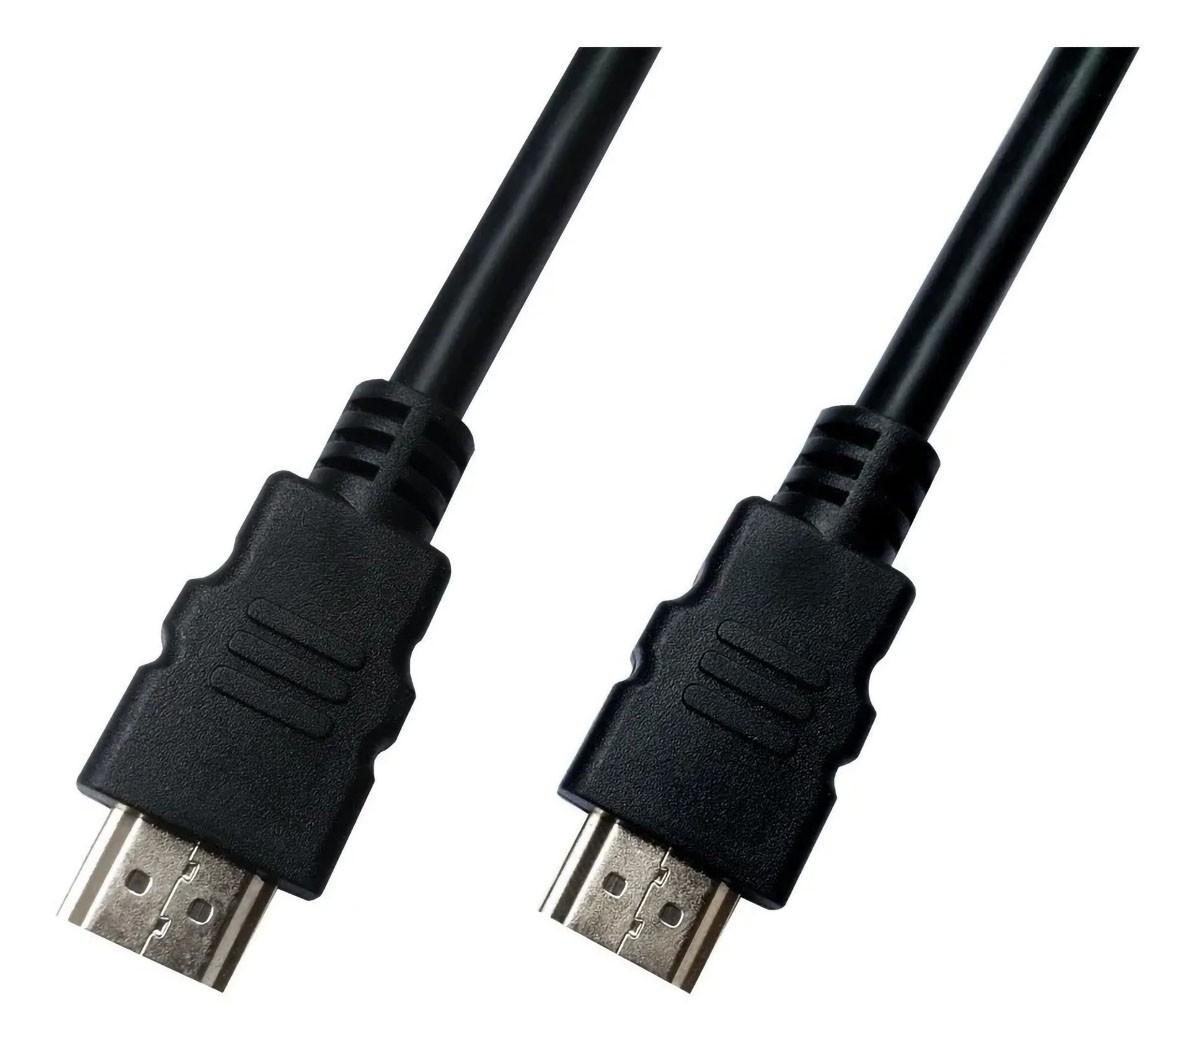 Cabo HDMI 3 Metros Proeletronic CAHD-2030